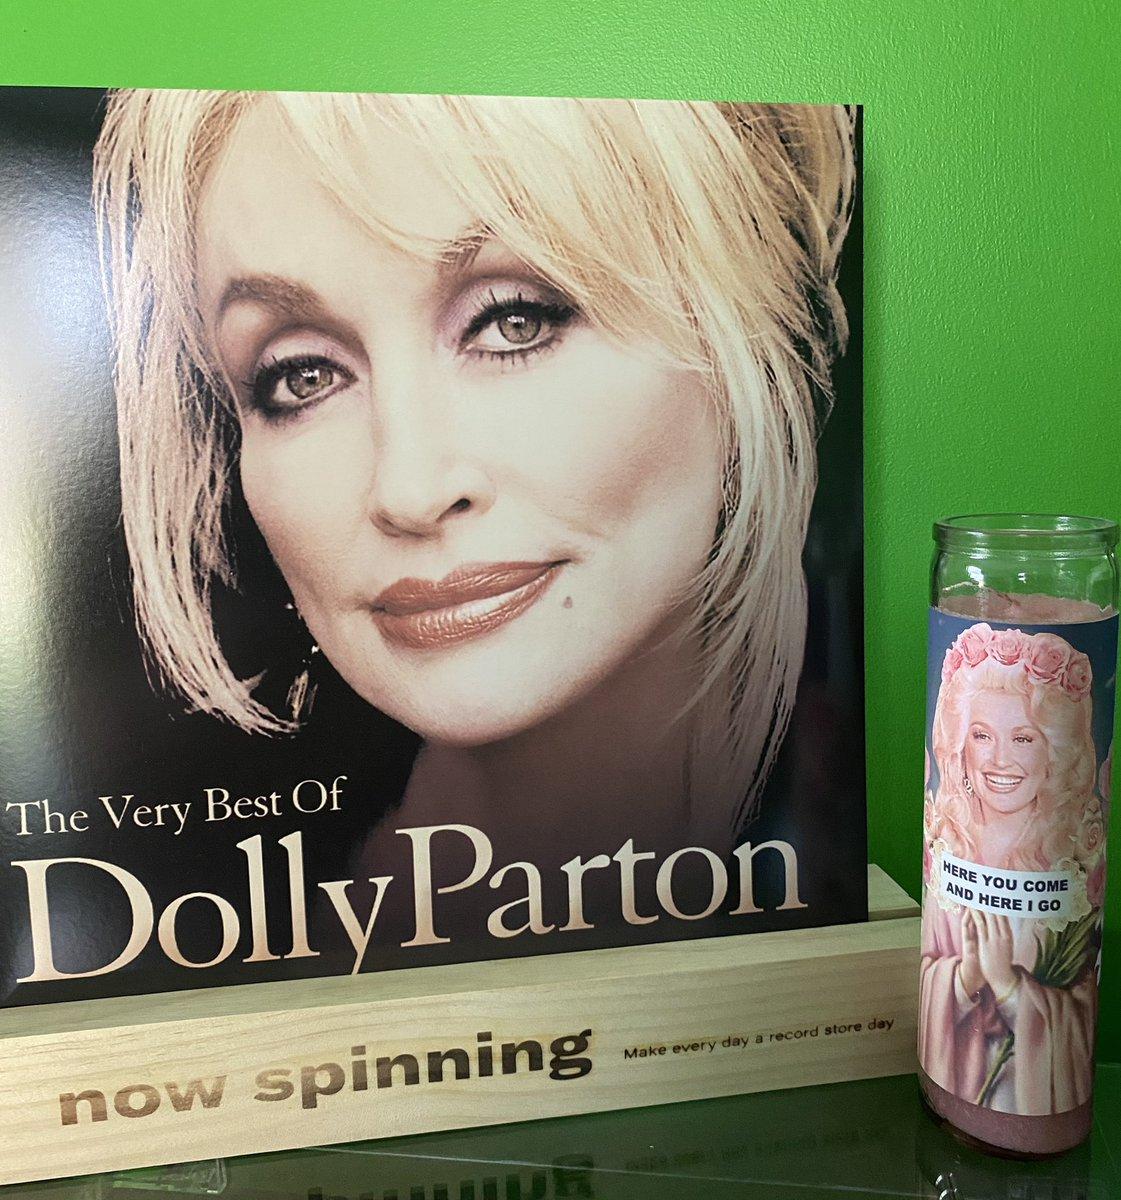 Happiest of birthdays to the songwriter/singer/author/actor/jokester/reader/encourager/donater/founder/singular Dolly Parton.